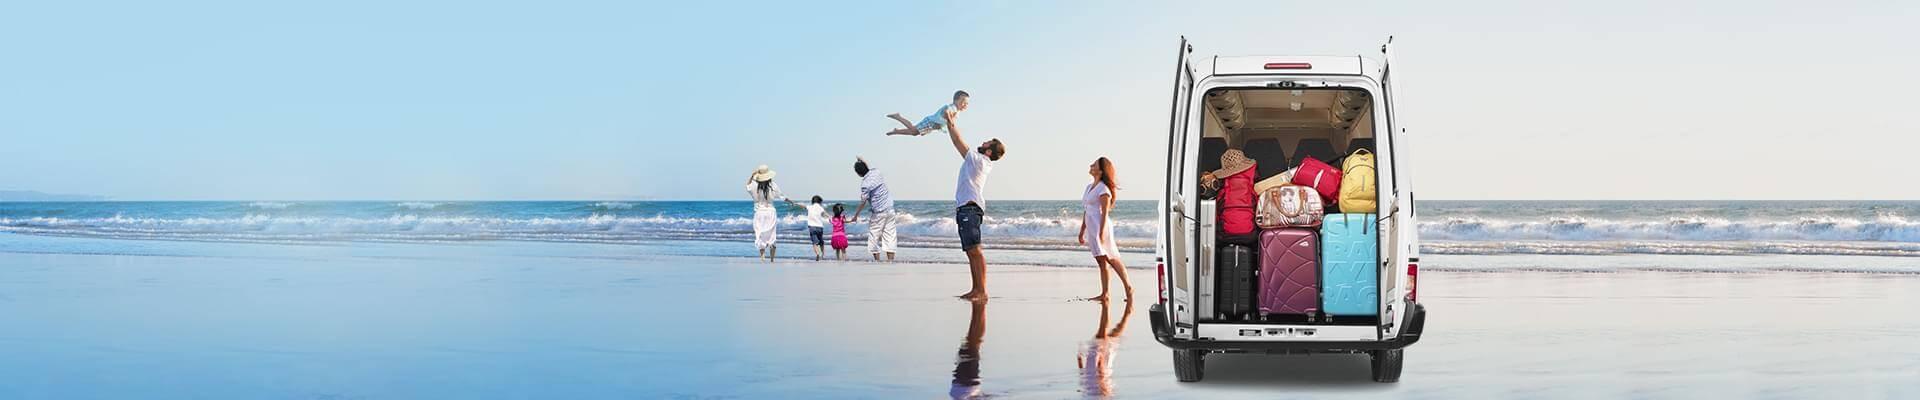 Tata Winger Tourist van family view